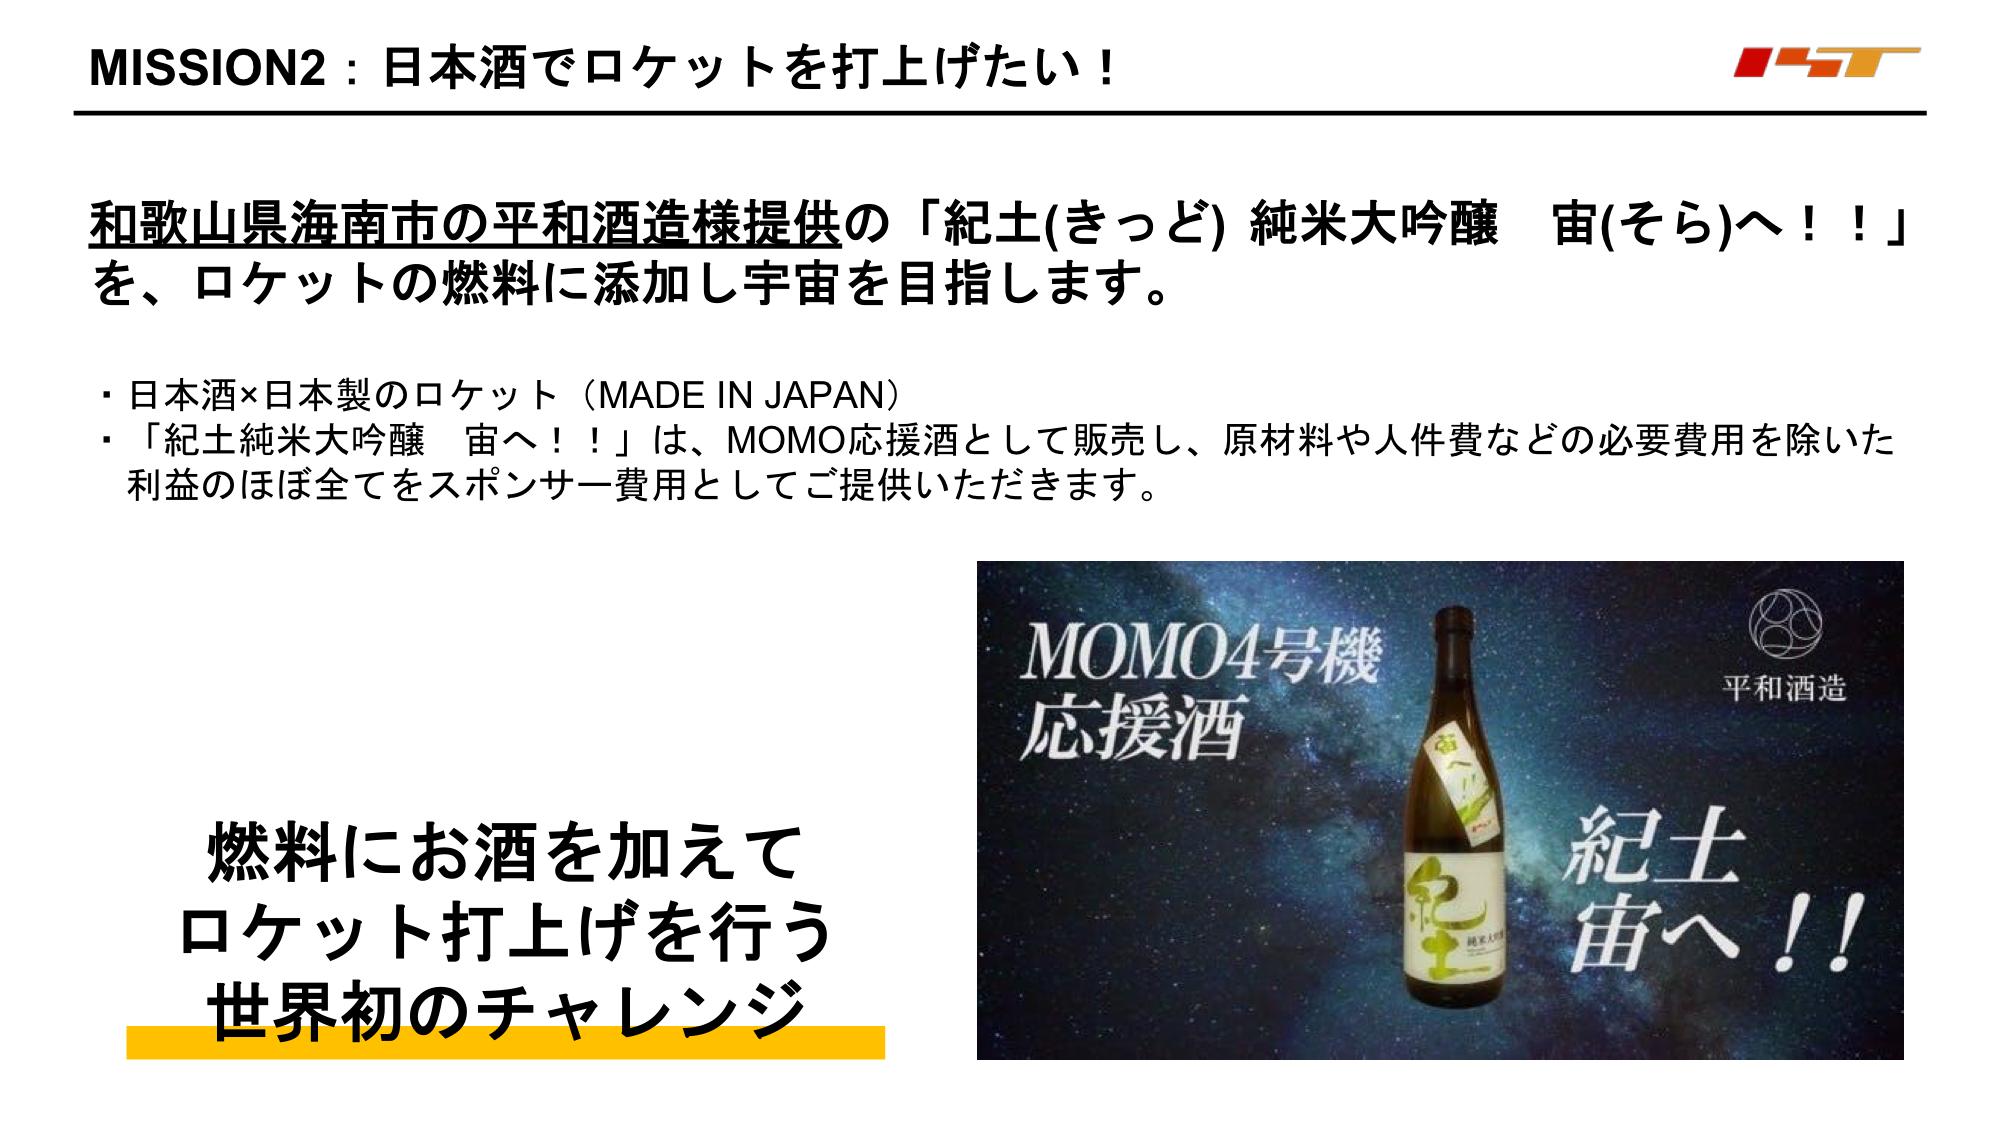 f:id:Imamura:20190628161236p:plain